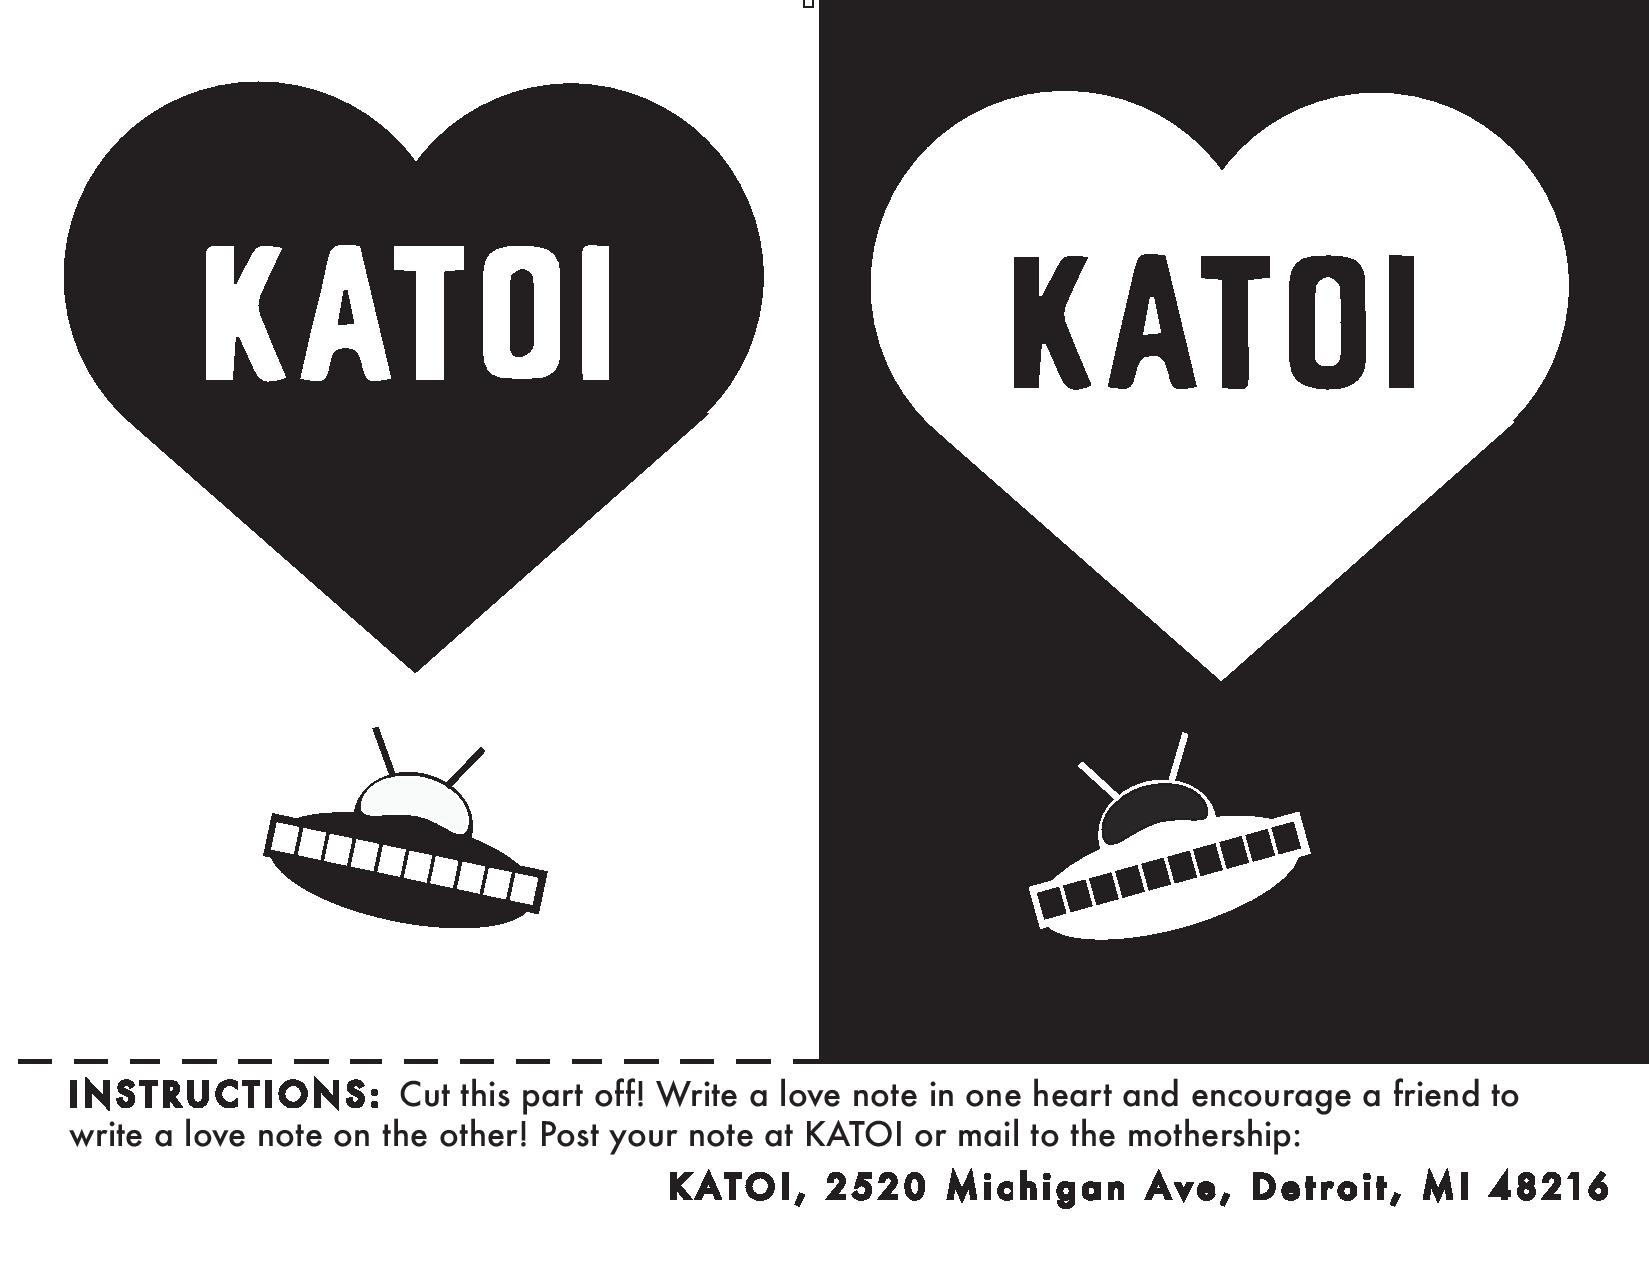 Detroit's restaurant family rallying around Katoi after fire